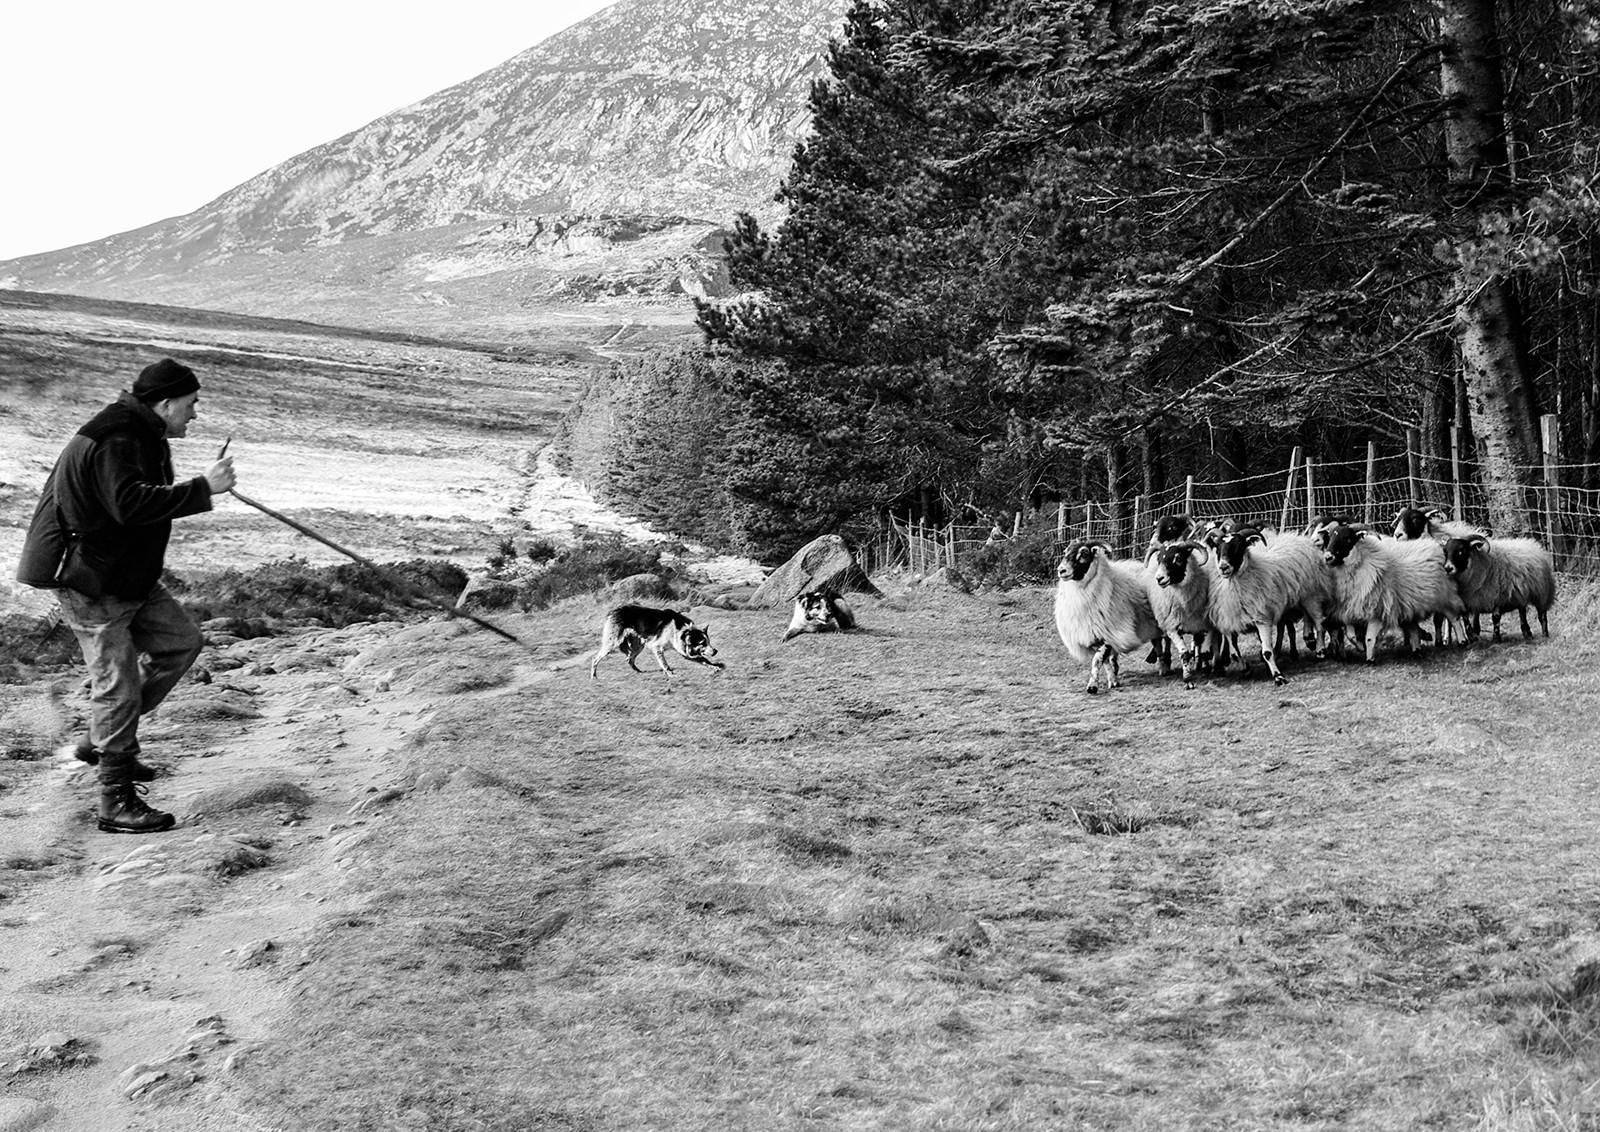 MONO - Seamus The Shepherd by Danny McCaughan (10 marks)